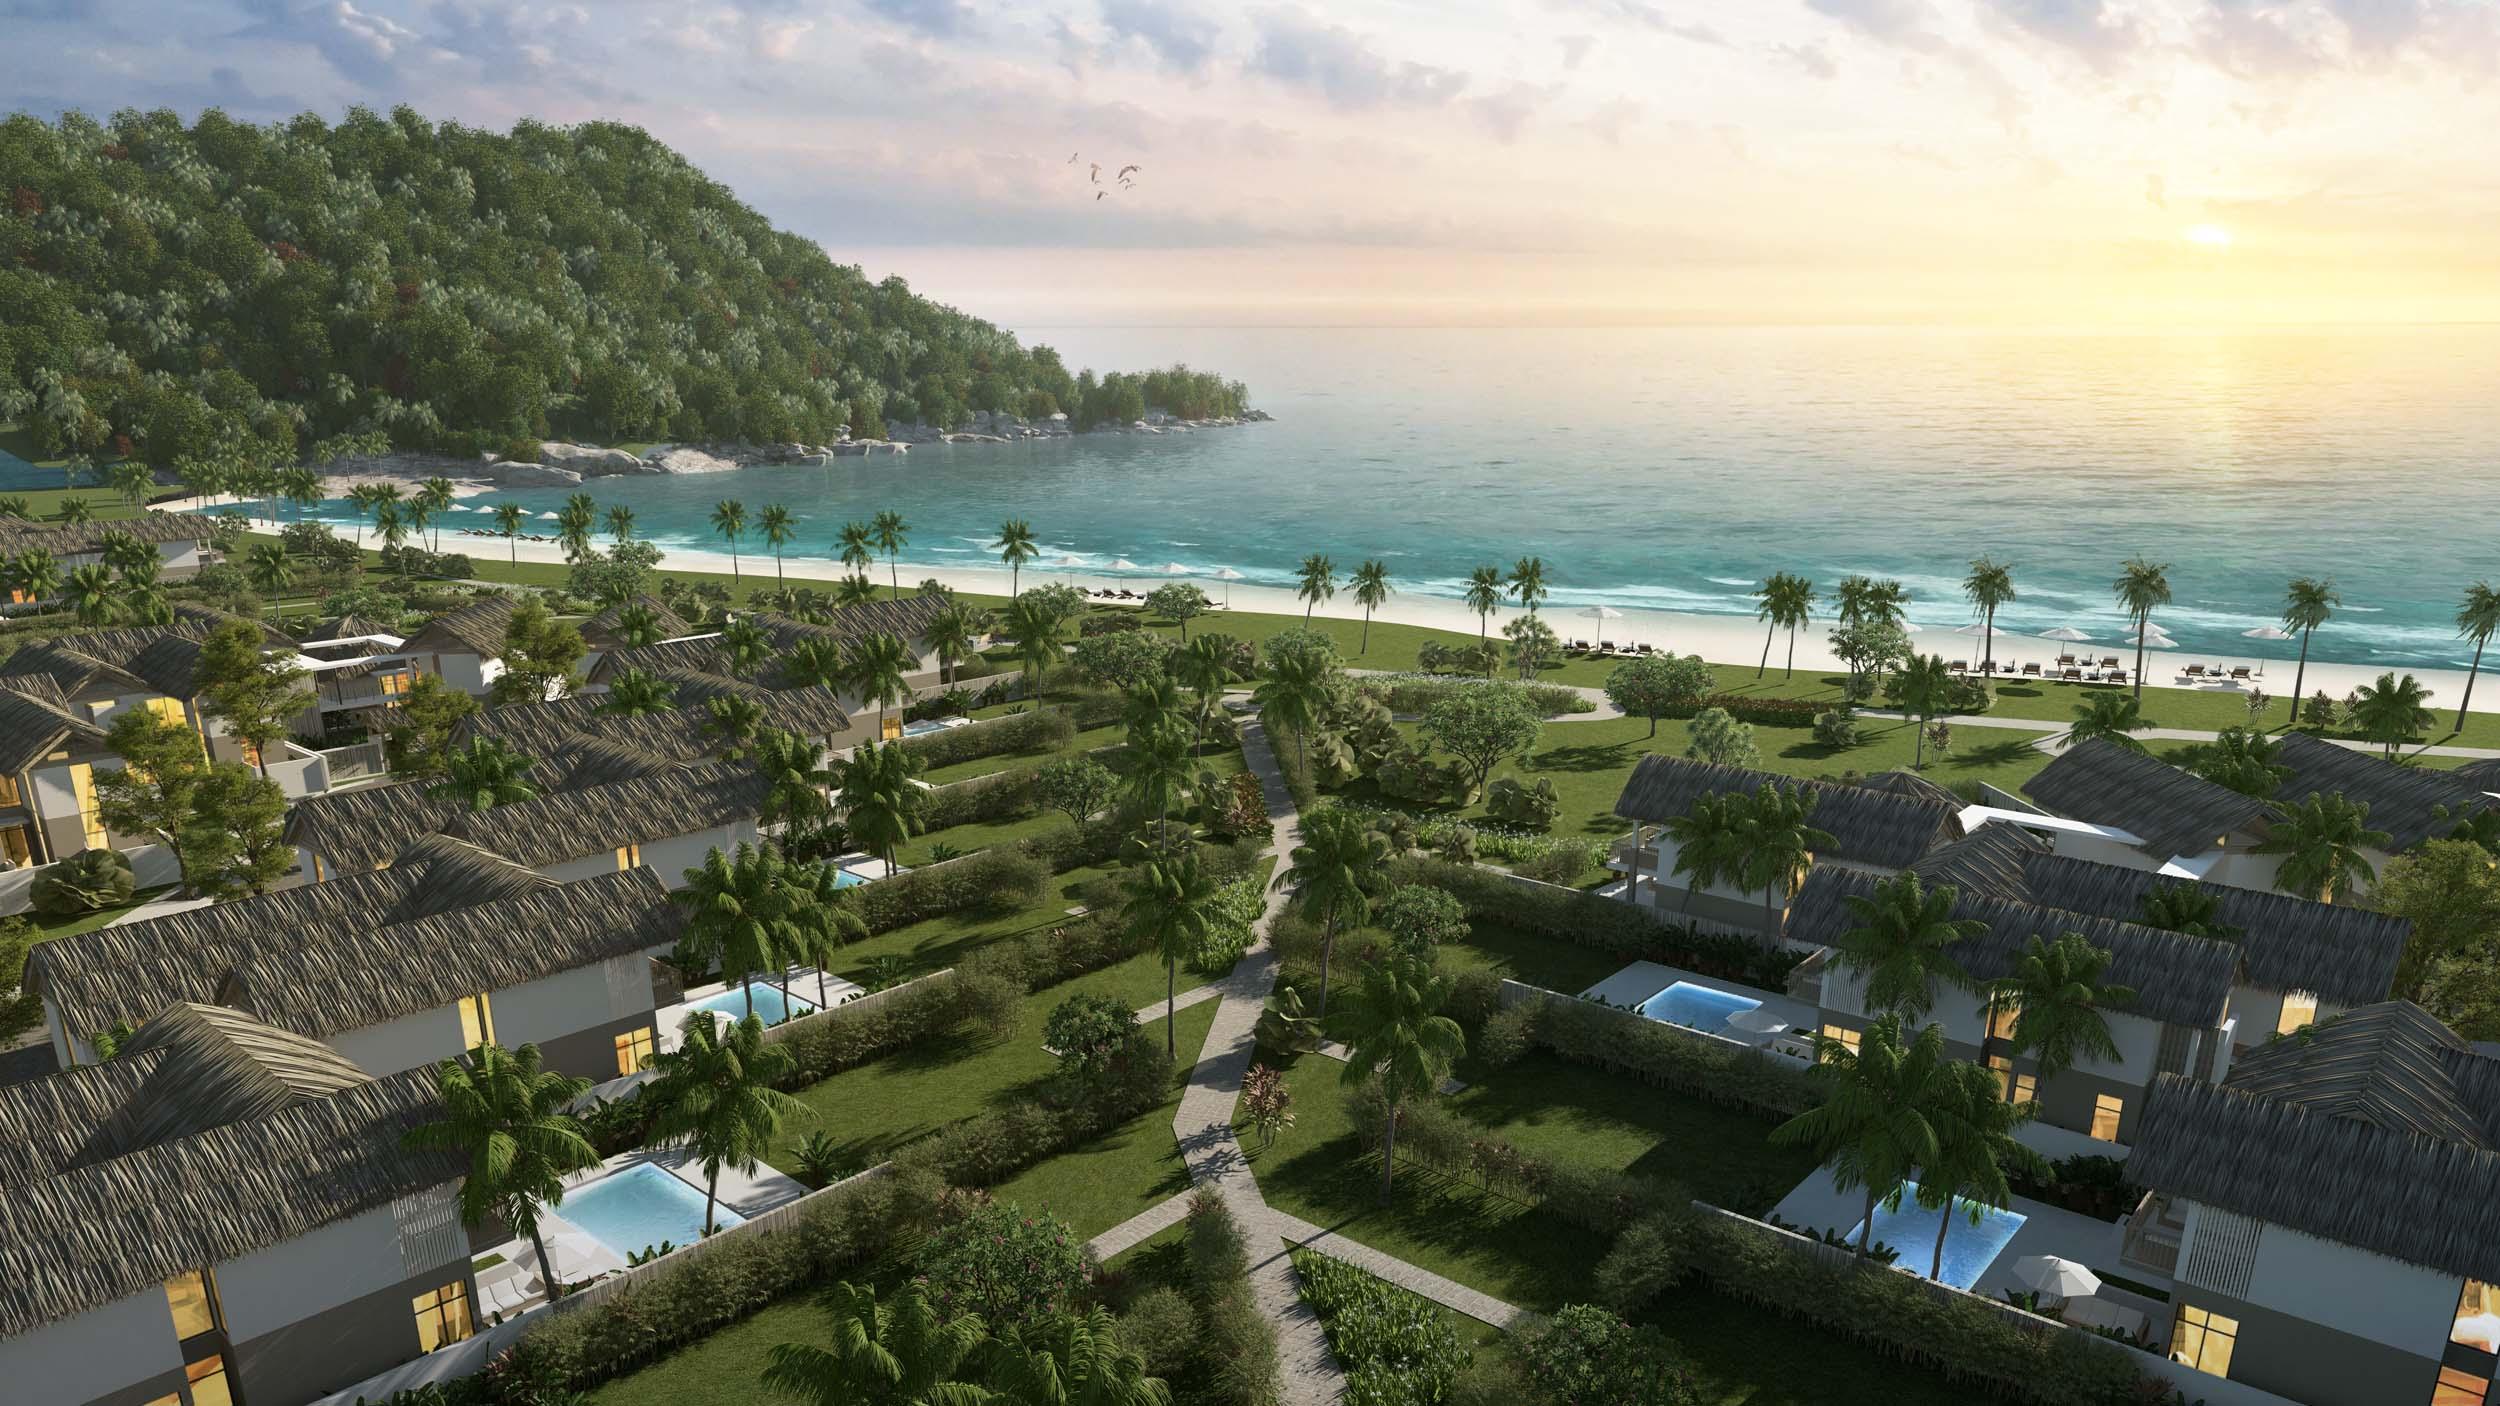 landslide of orders at launch of sun premier village kem beach resort